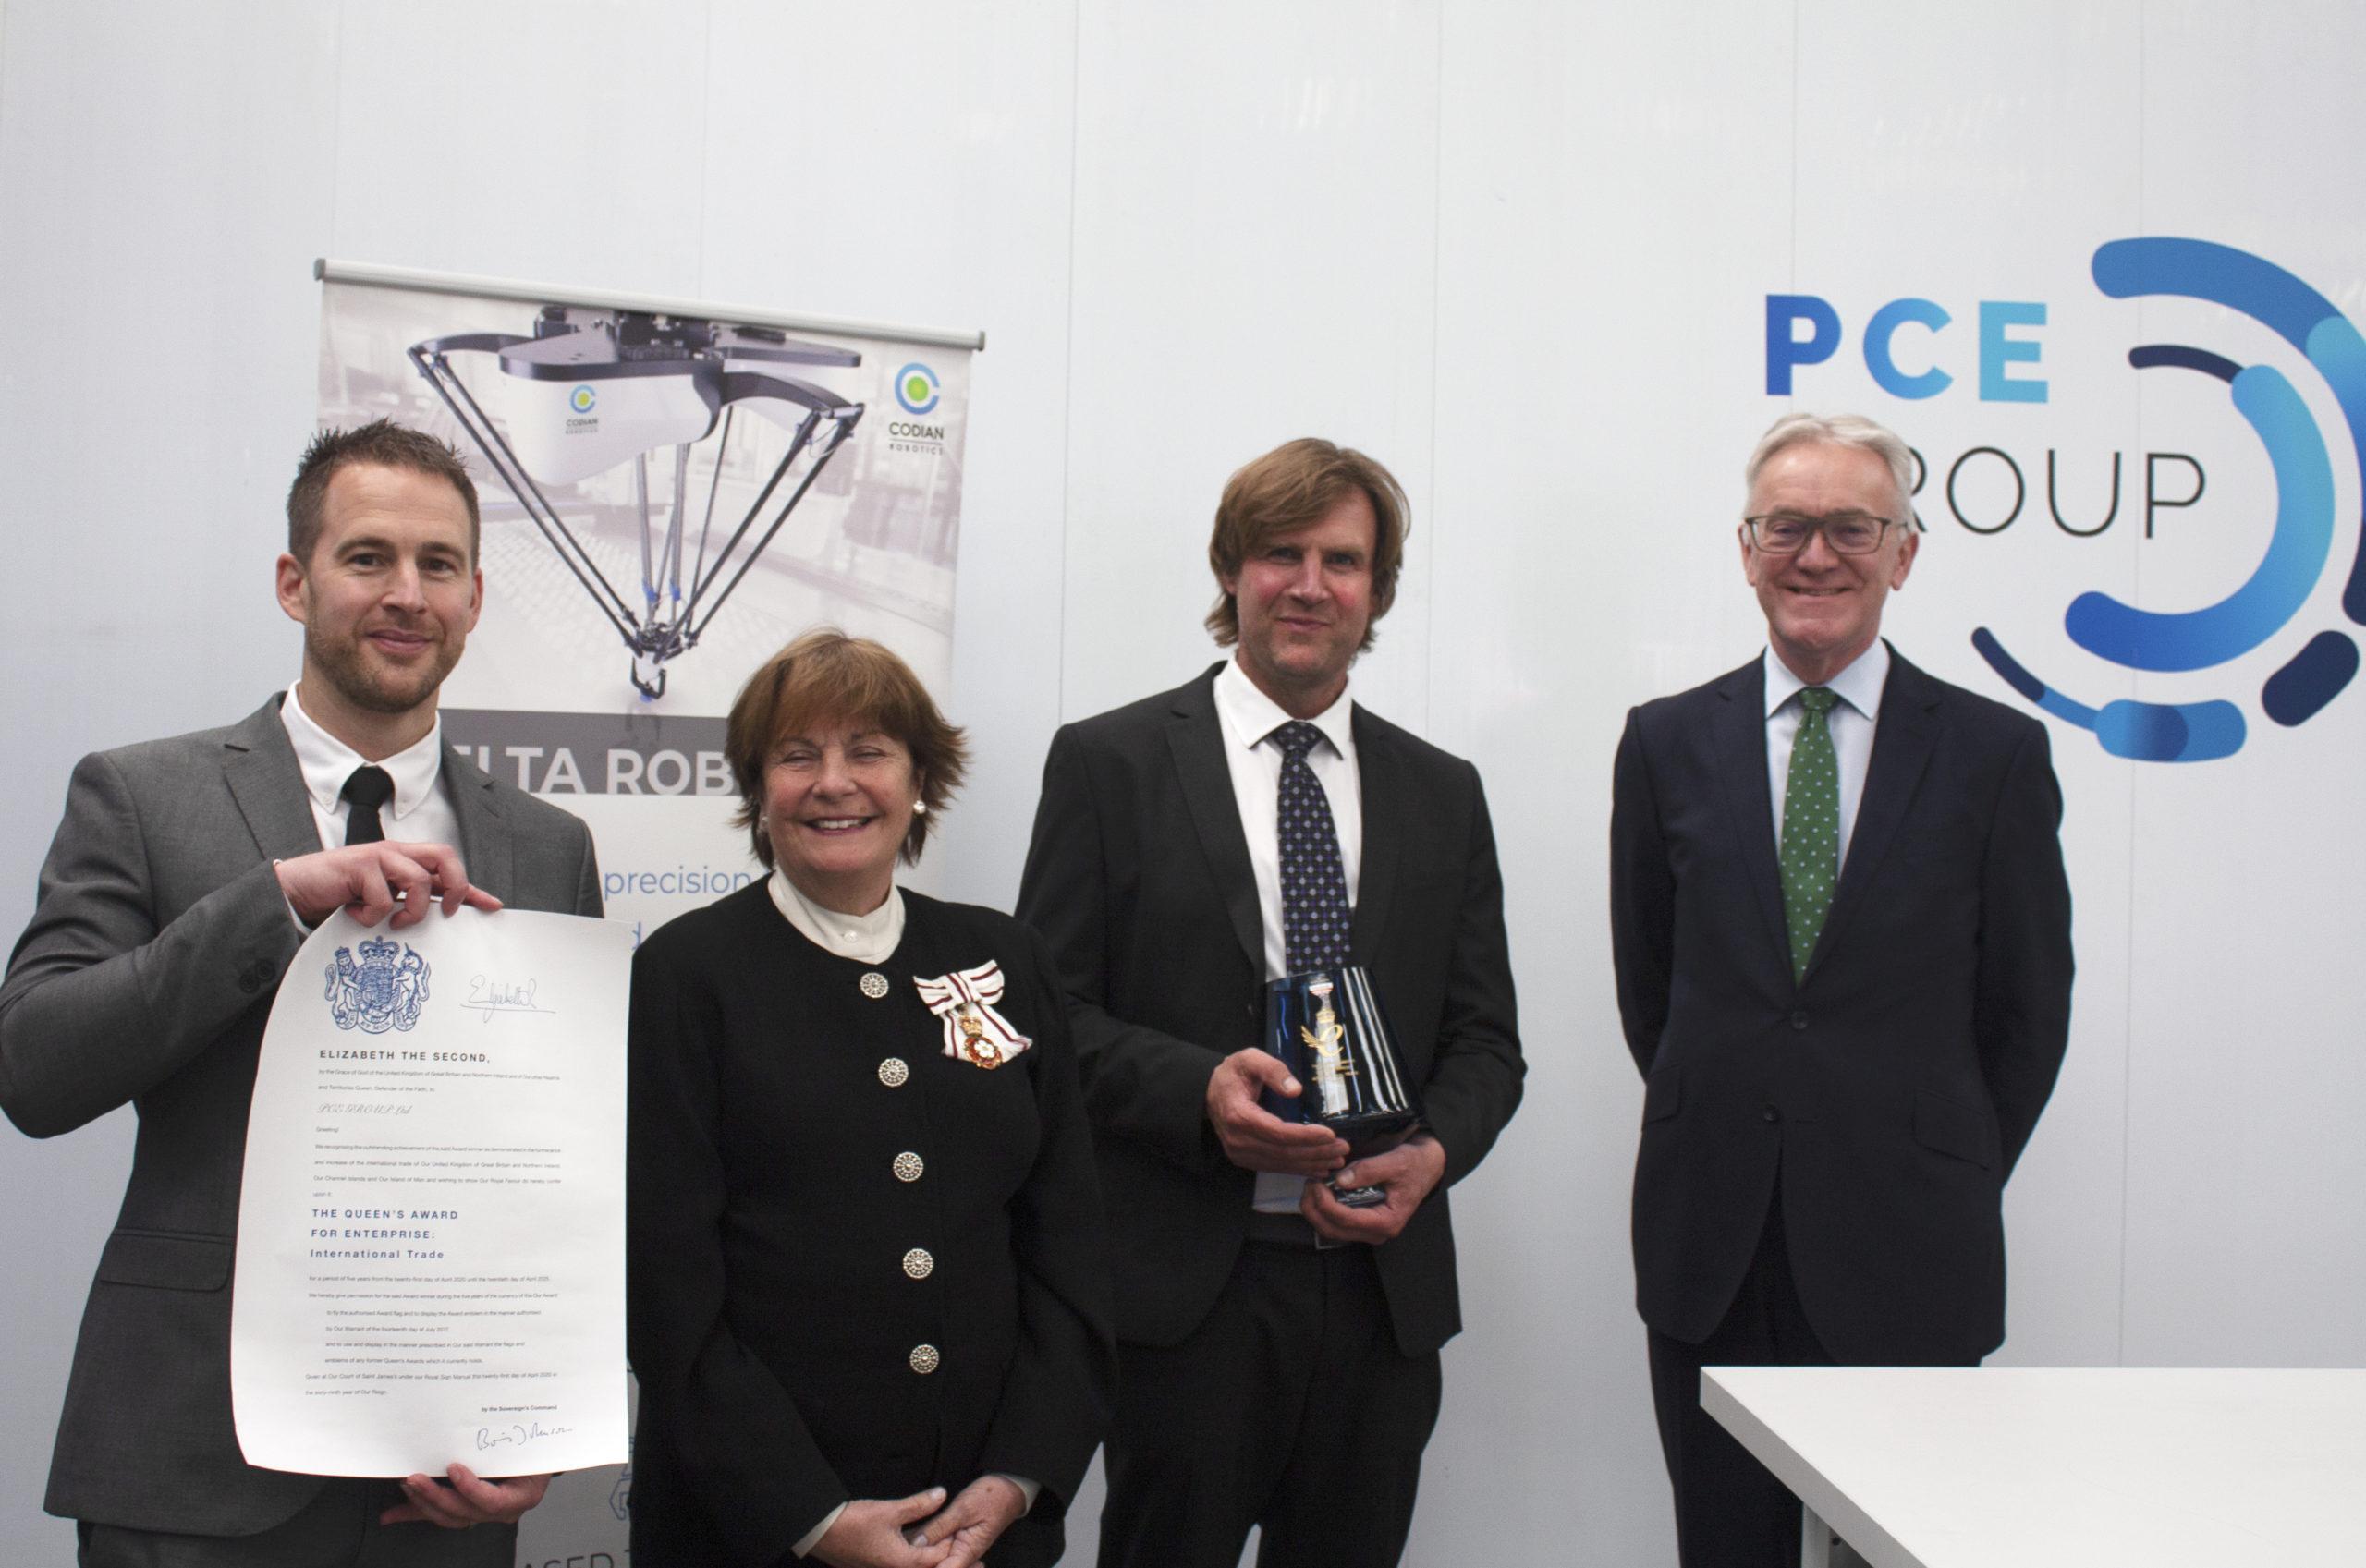 PCE Group receive the Queen's Award for Enterprise